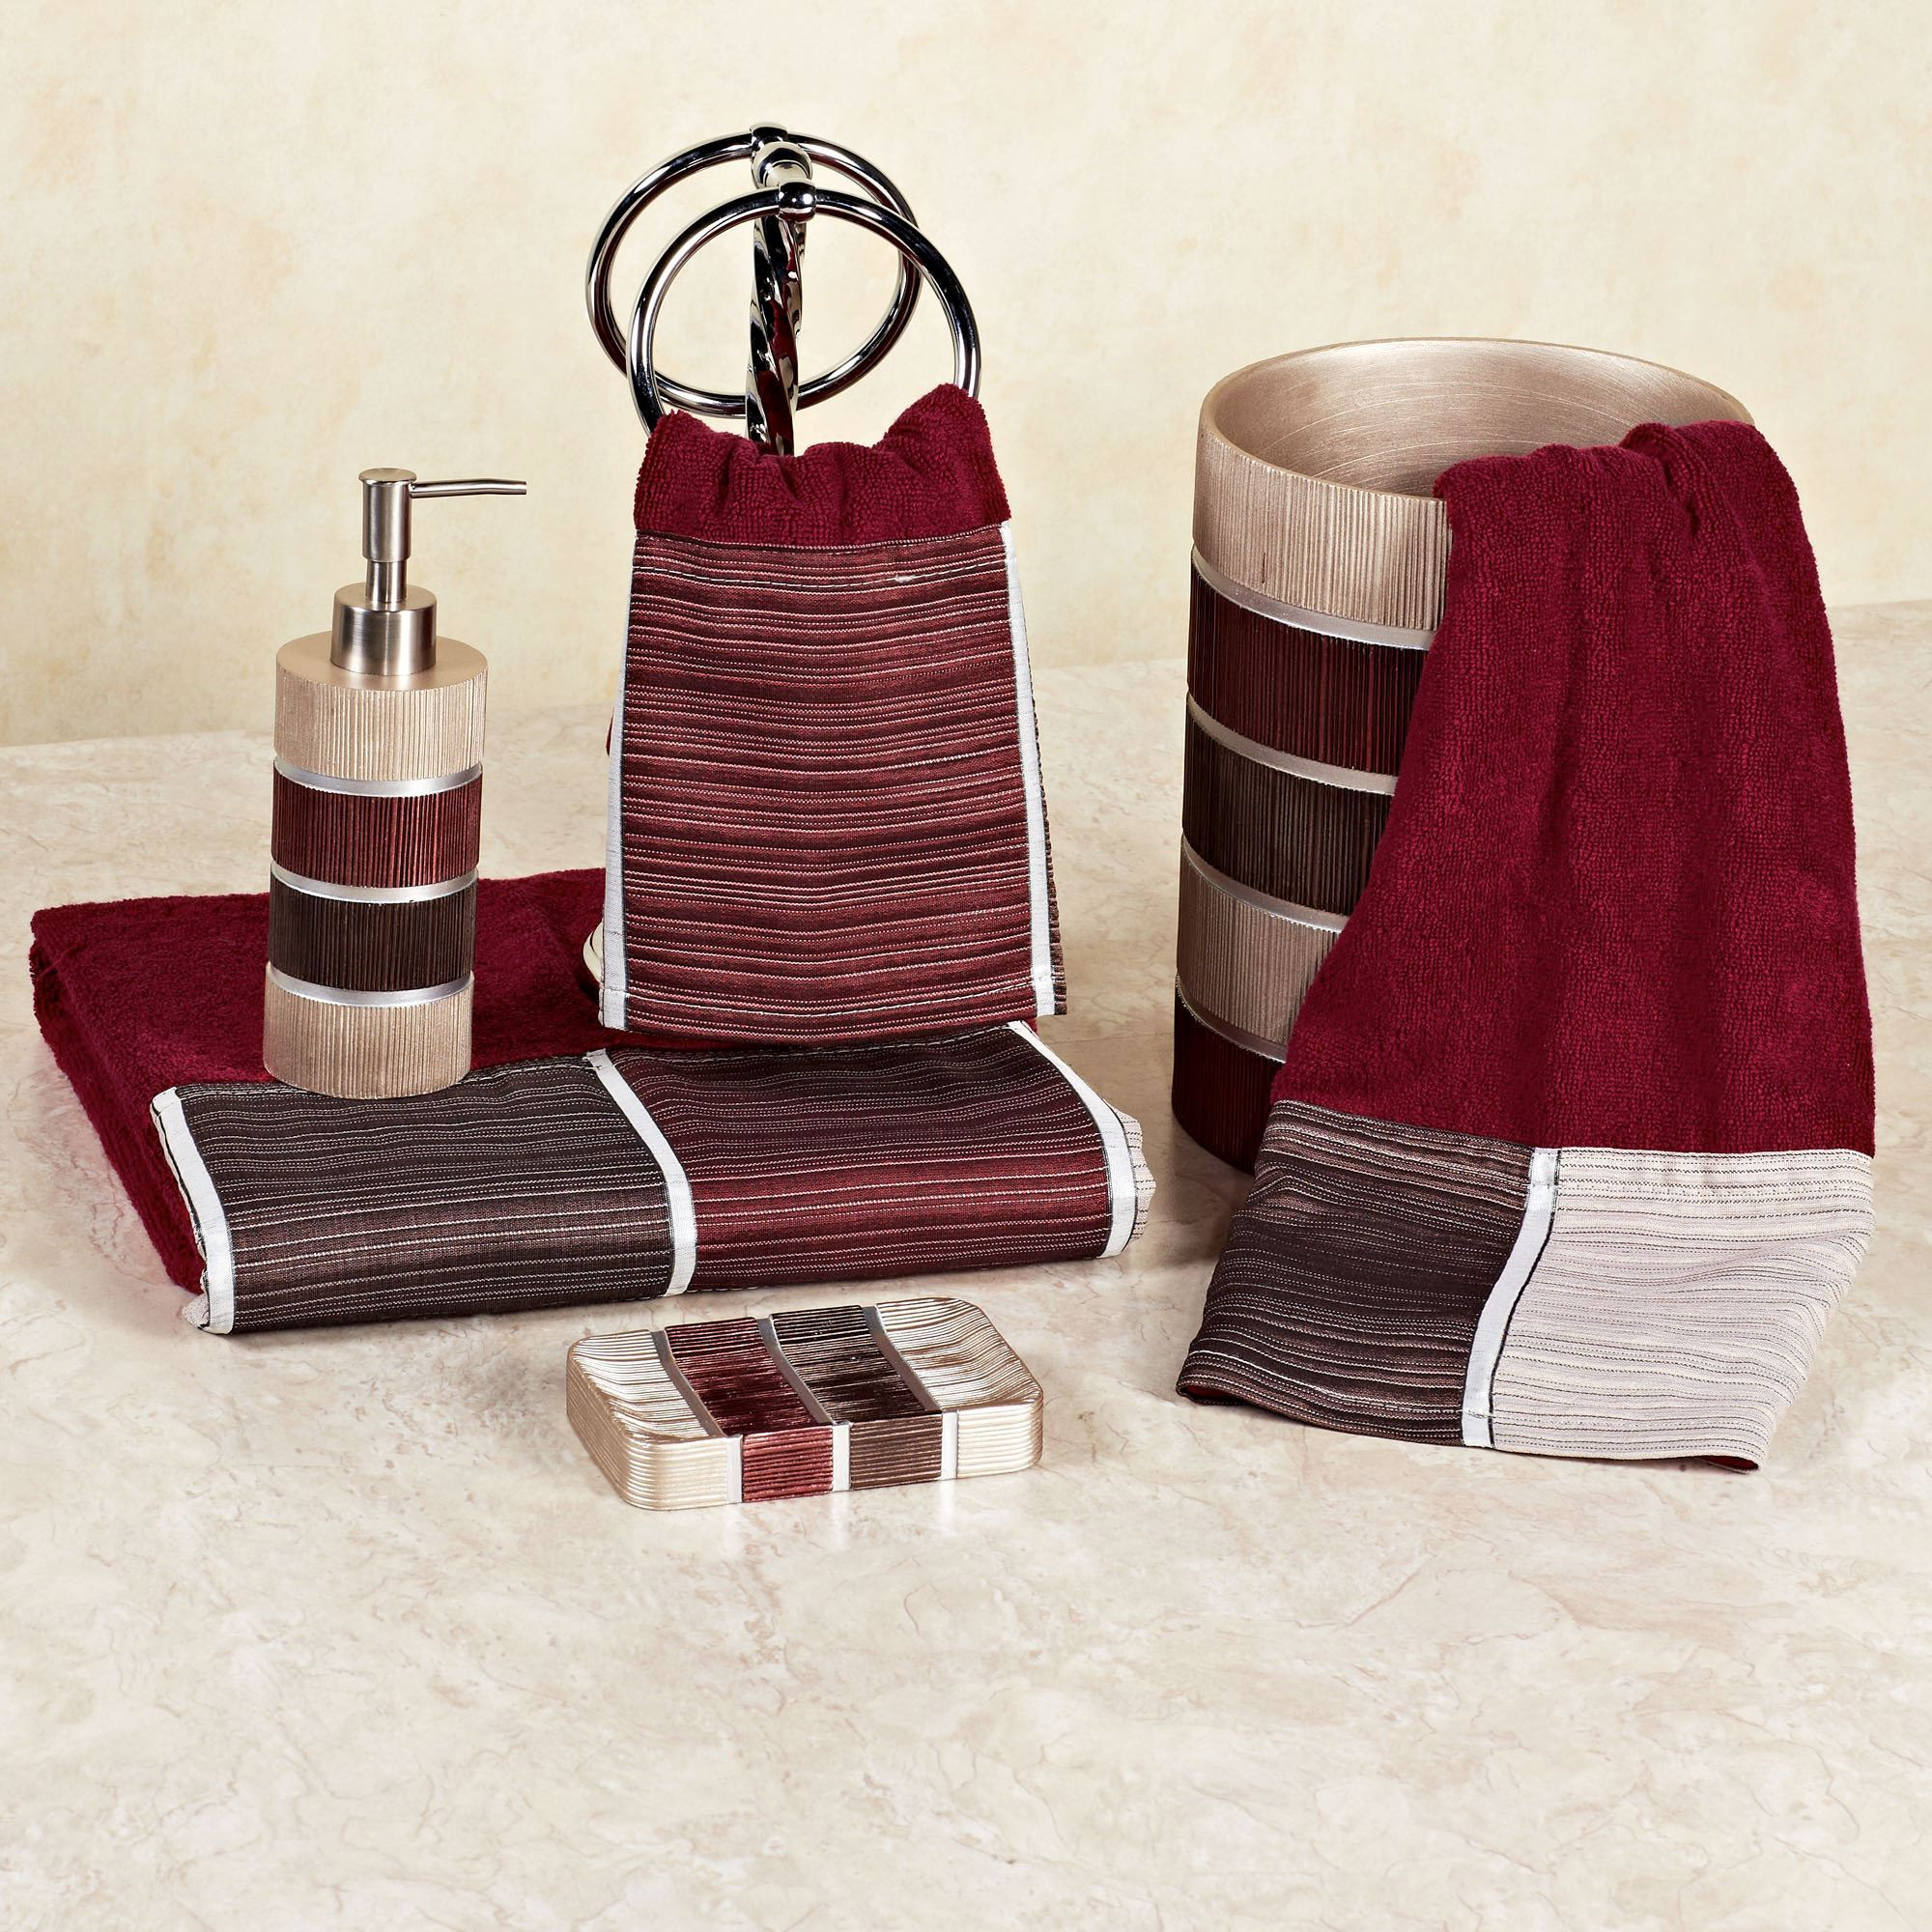 Fullsize Of Bath Towel Sets